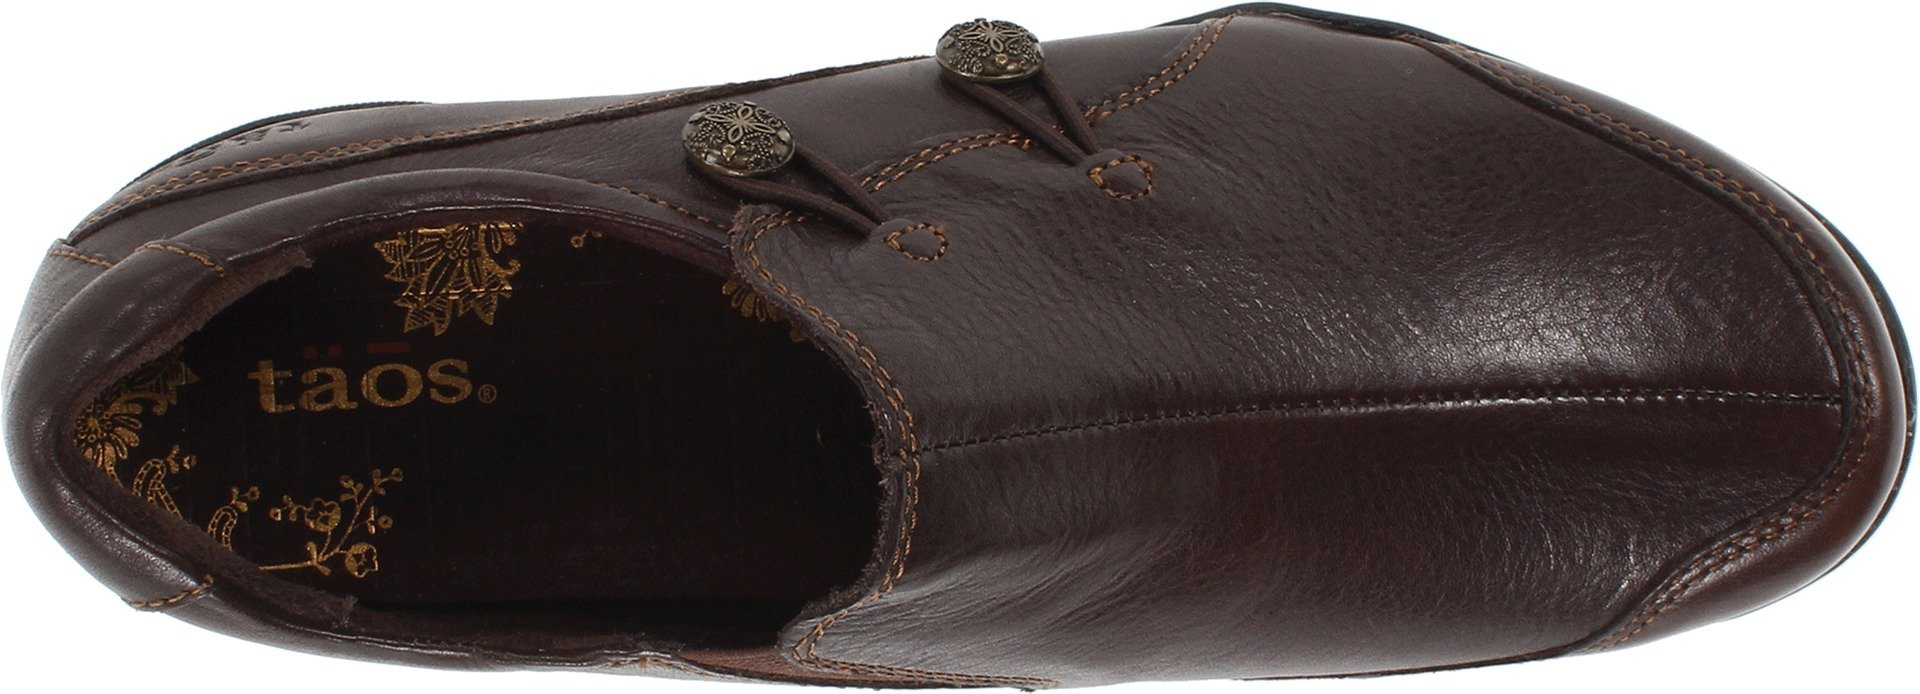 Taos Women's Encore Flat,Chocolate,7 M US by Taos Footwear (Image #7)